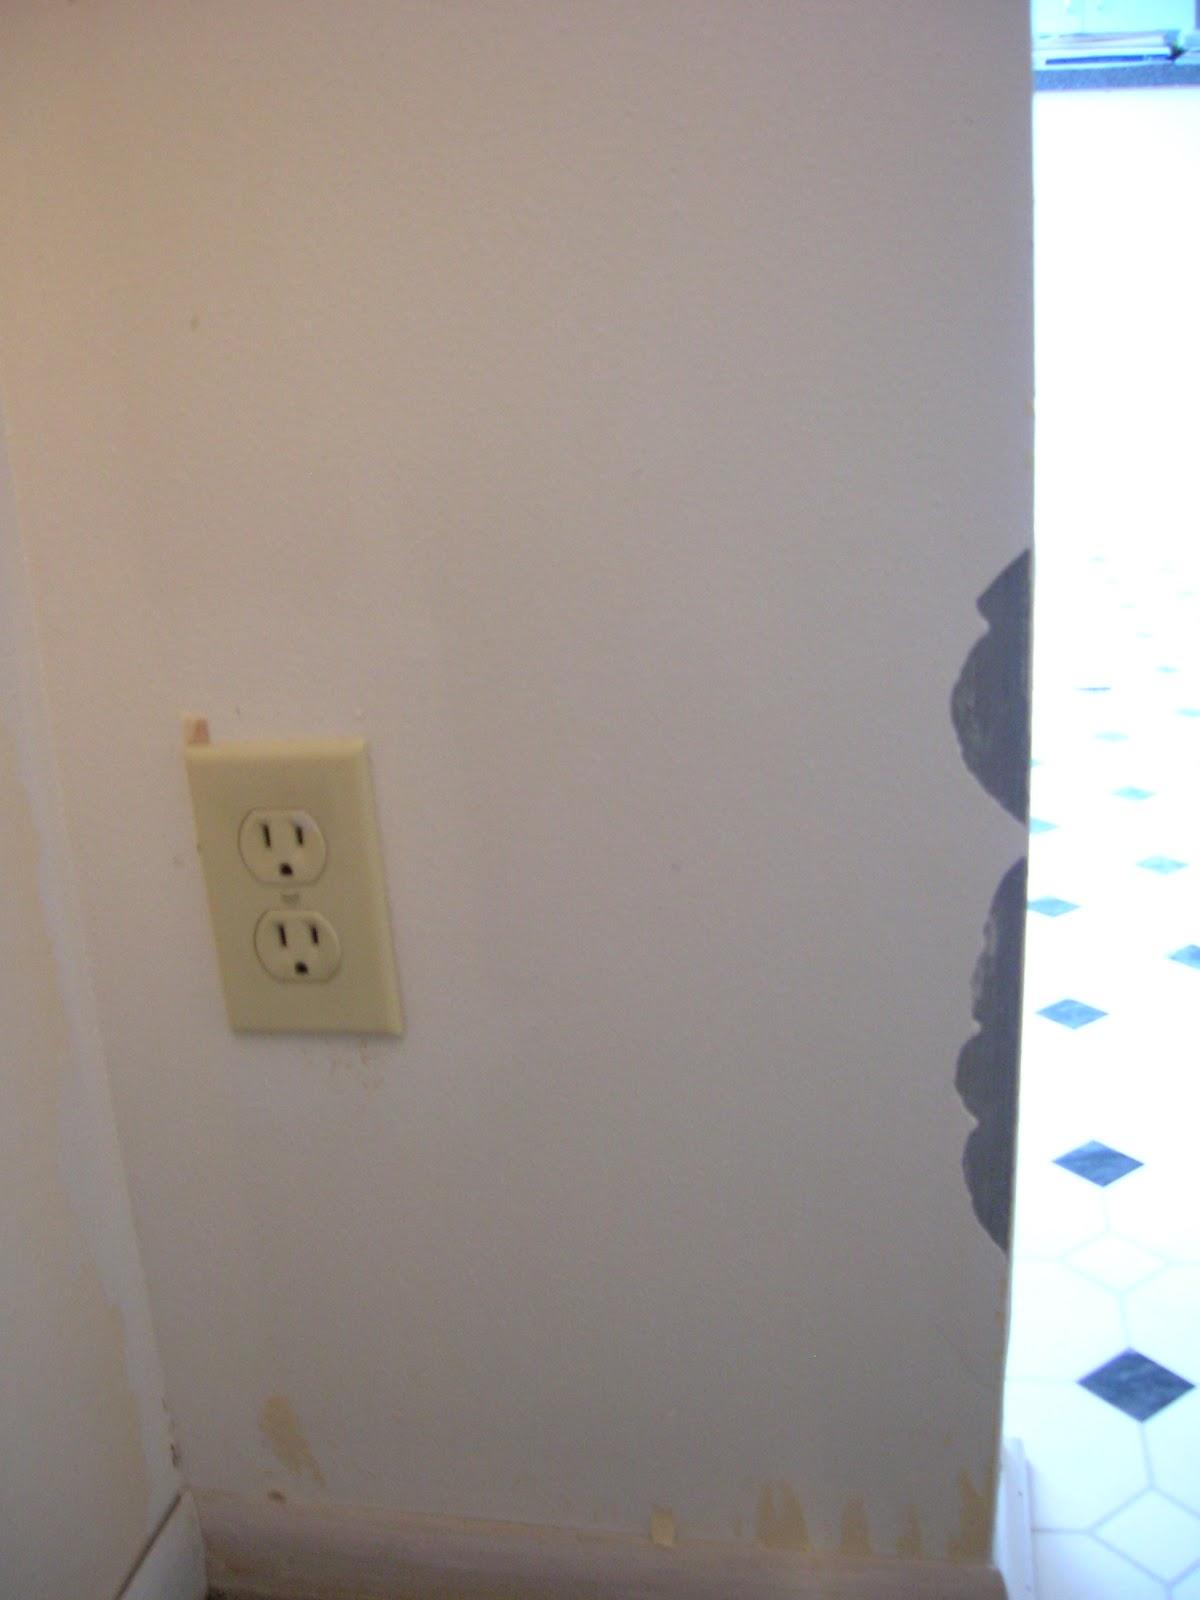 http://2.bp.blogspot.com/-6LOwsfpK0gI/T241rneDhFI/AAAAAAAAGwU/aoRsSolK7rA/s1600/family+room+redo+removing+wallpaper+001.JPG